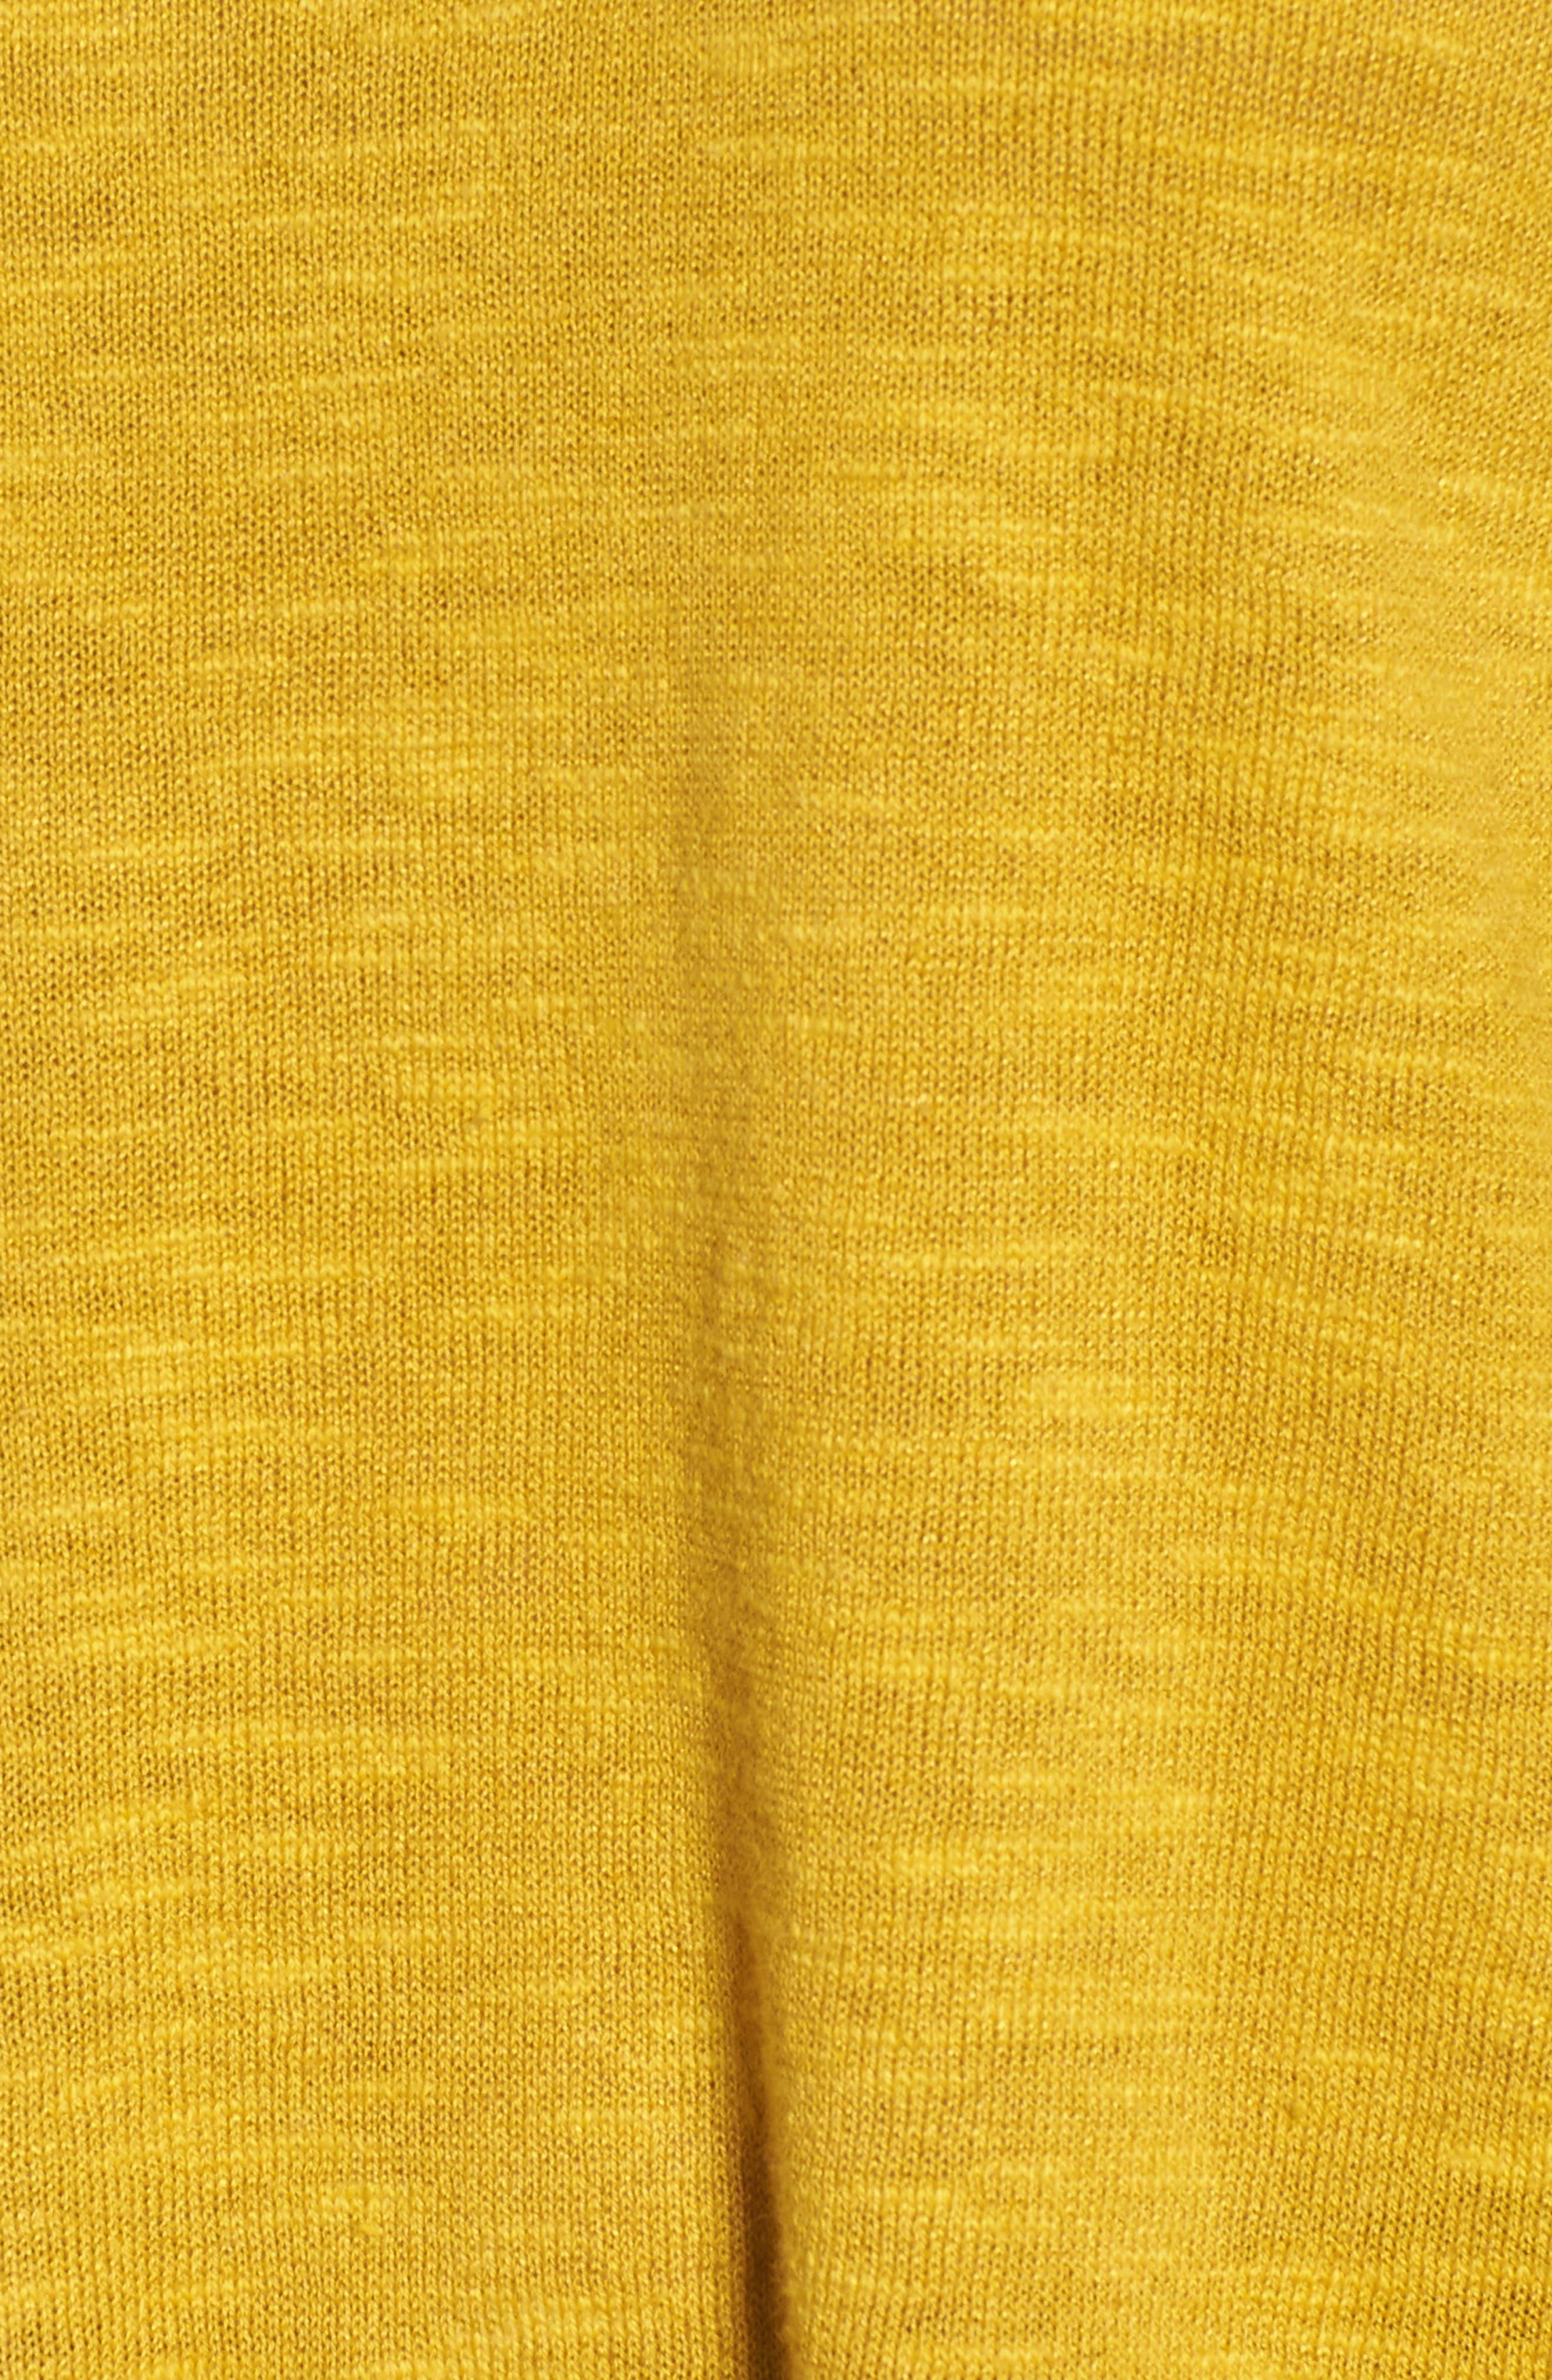 Organic Knit Crewneck Tunic Top,                             Alternate thumbnail 5, color,